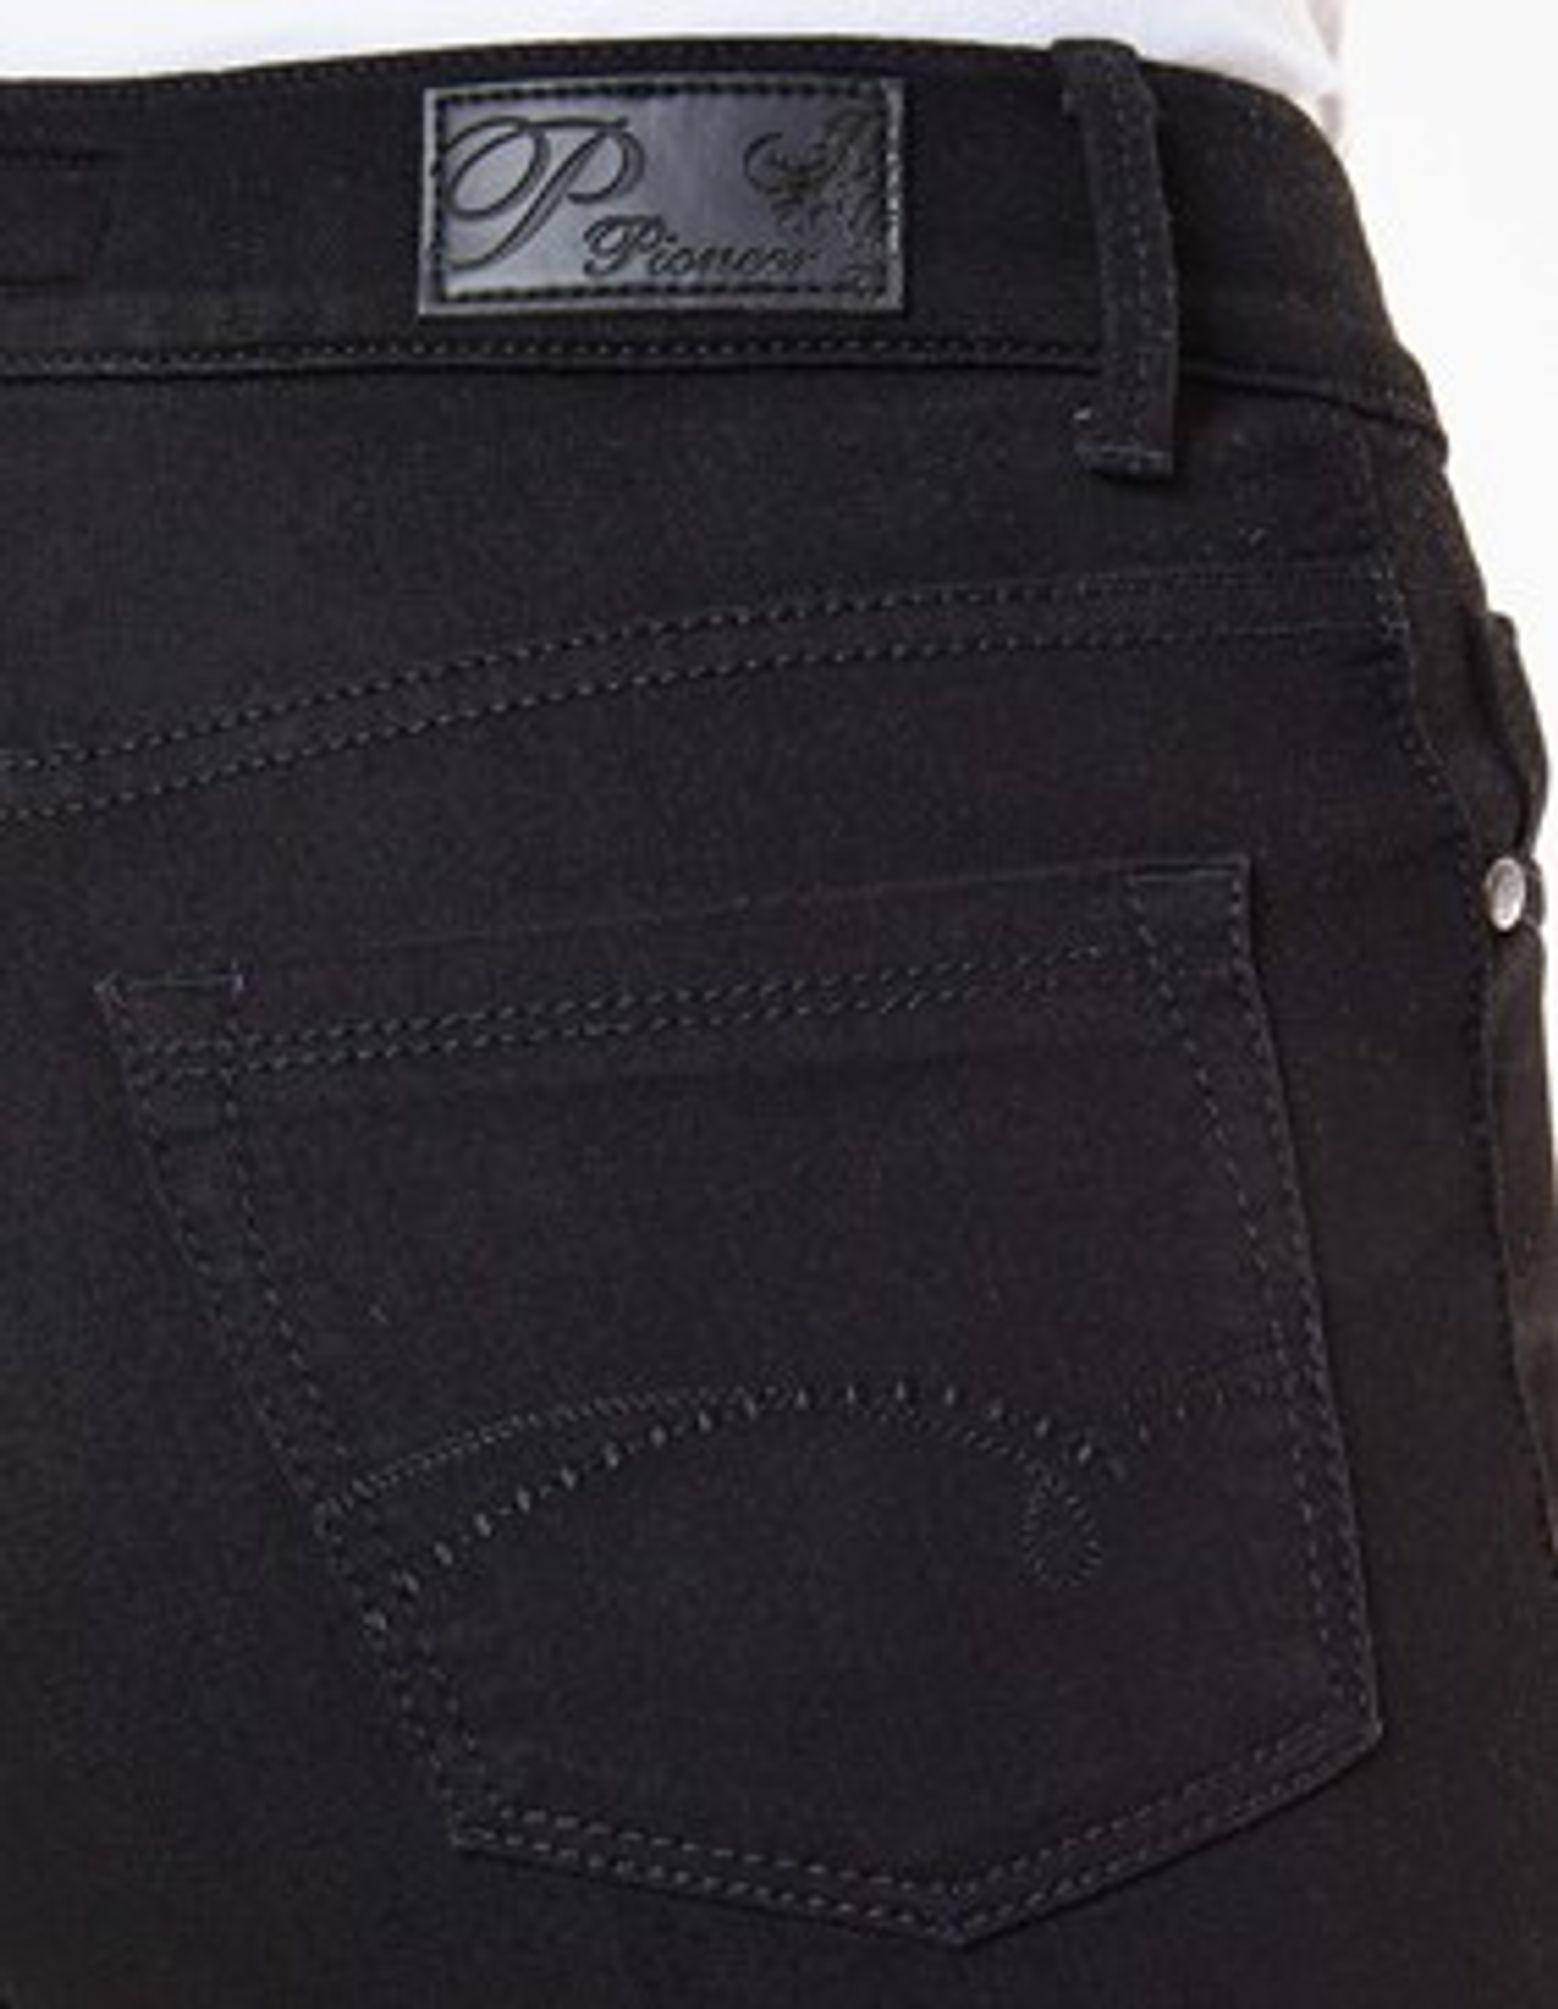 ef81821505c1 Pioneer - Damen 5-Pocket Jeans in der Farbe Schwarz, Regular Fit, Kate